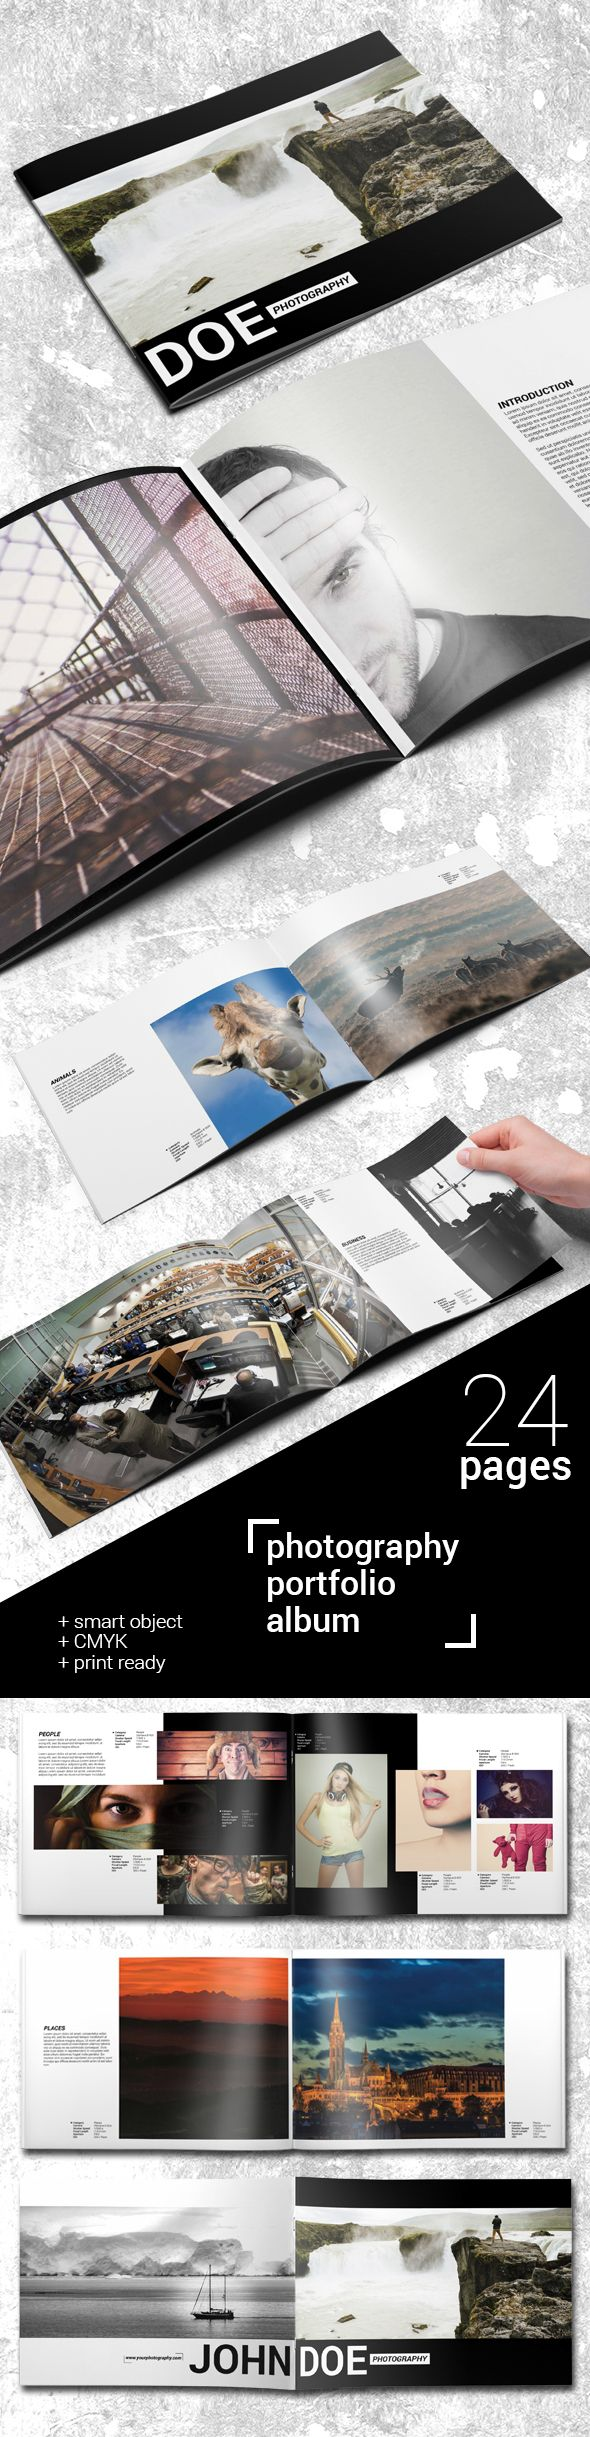 24 Pages Photography Portfolio Album on Behance